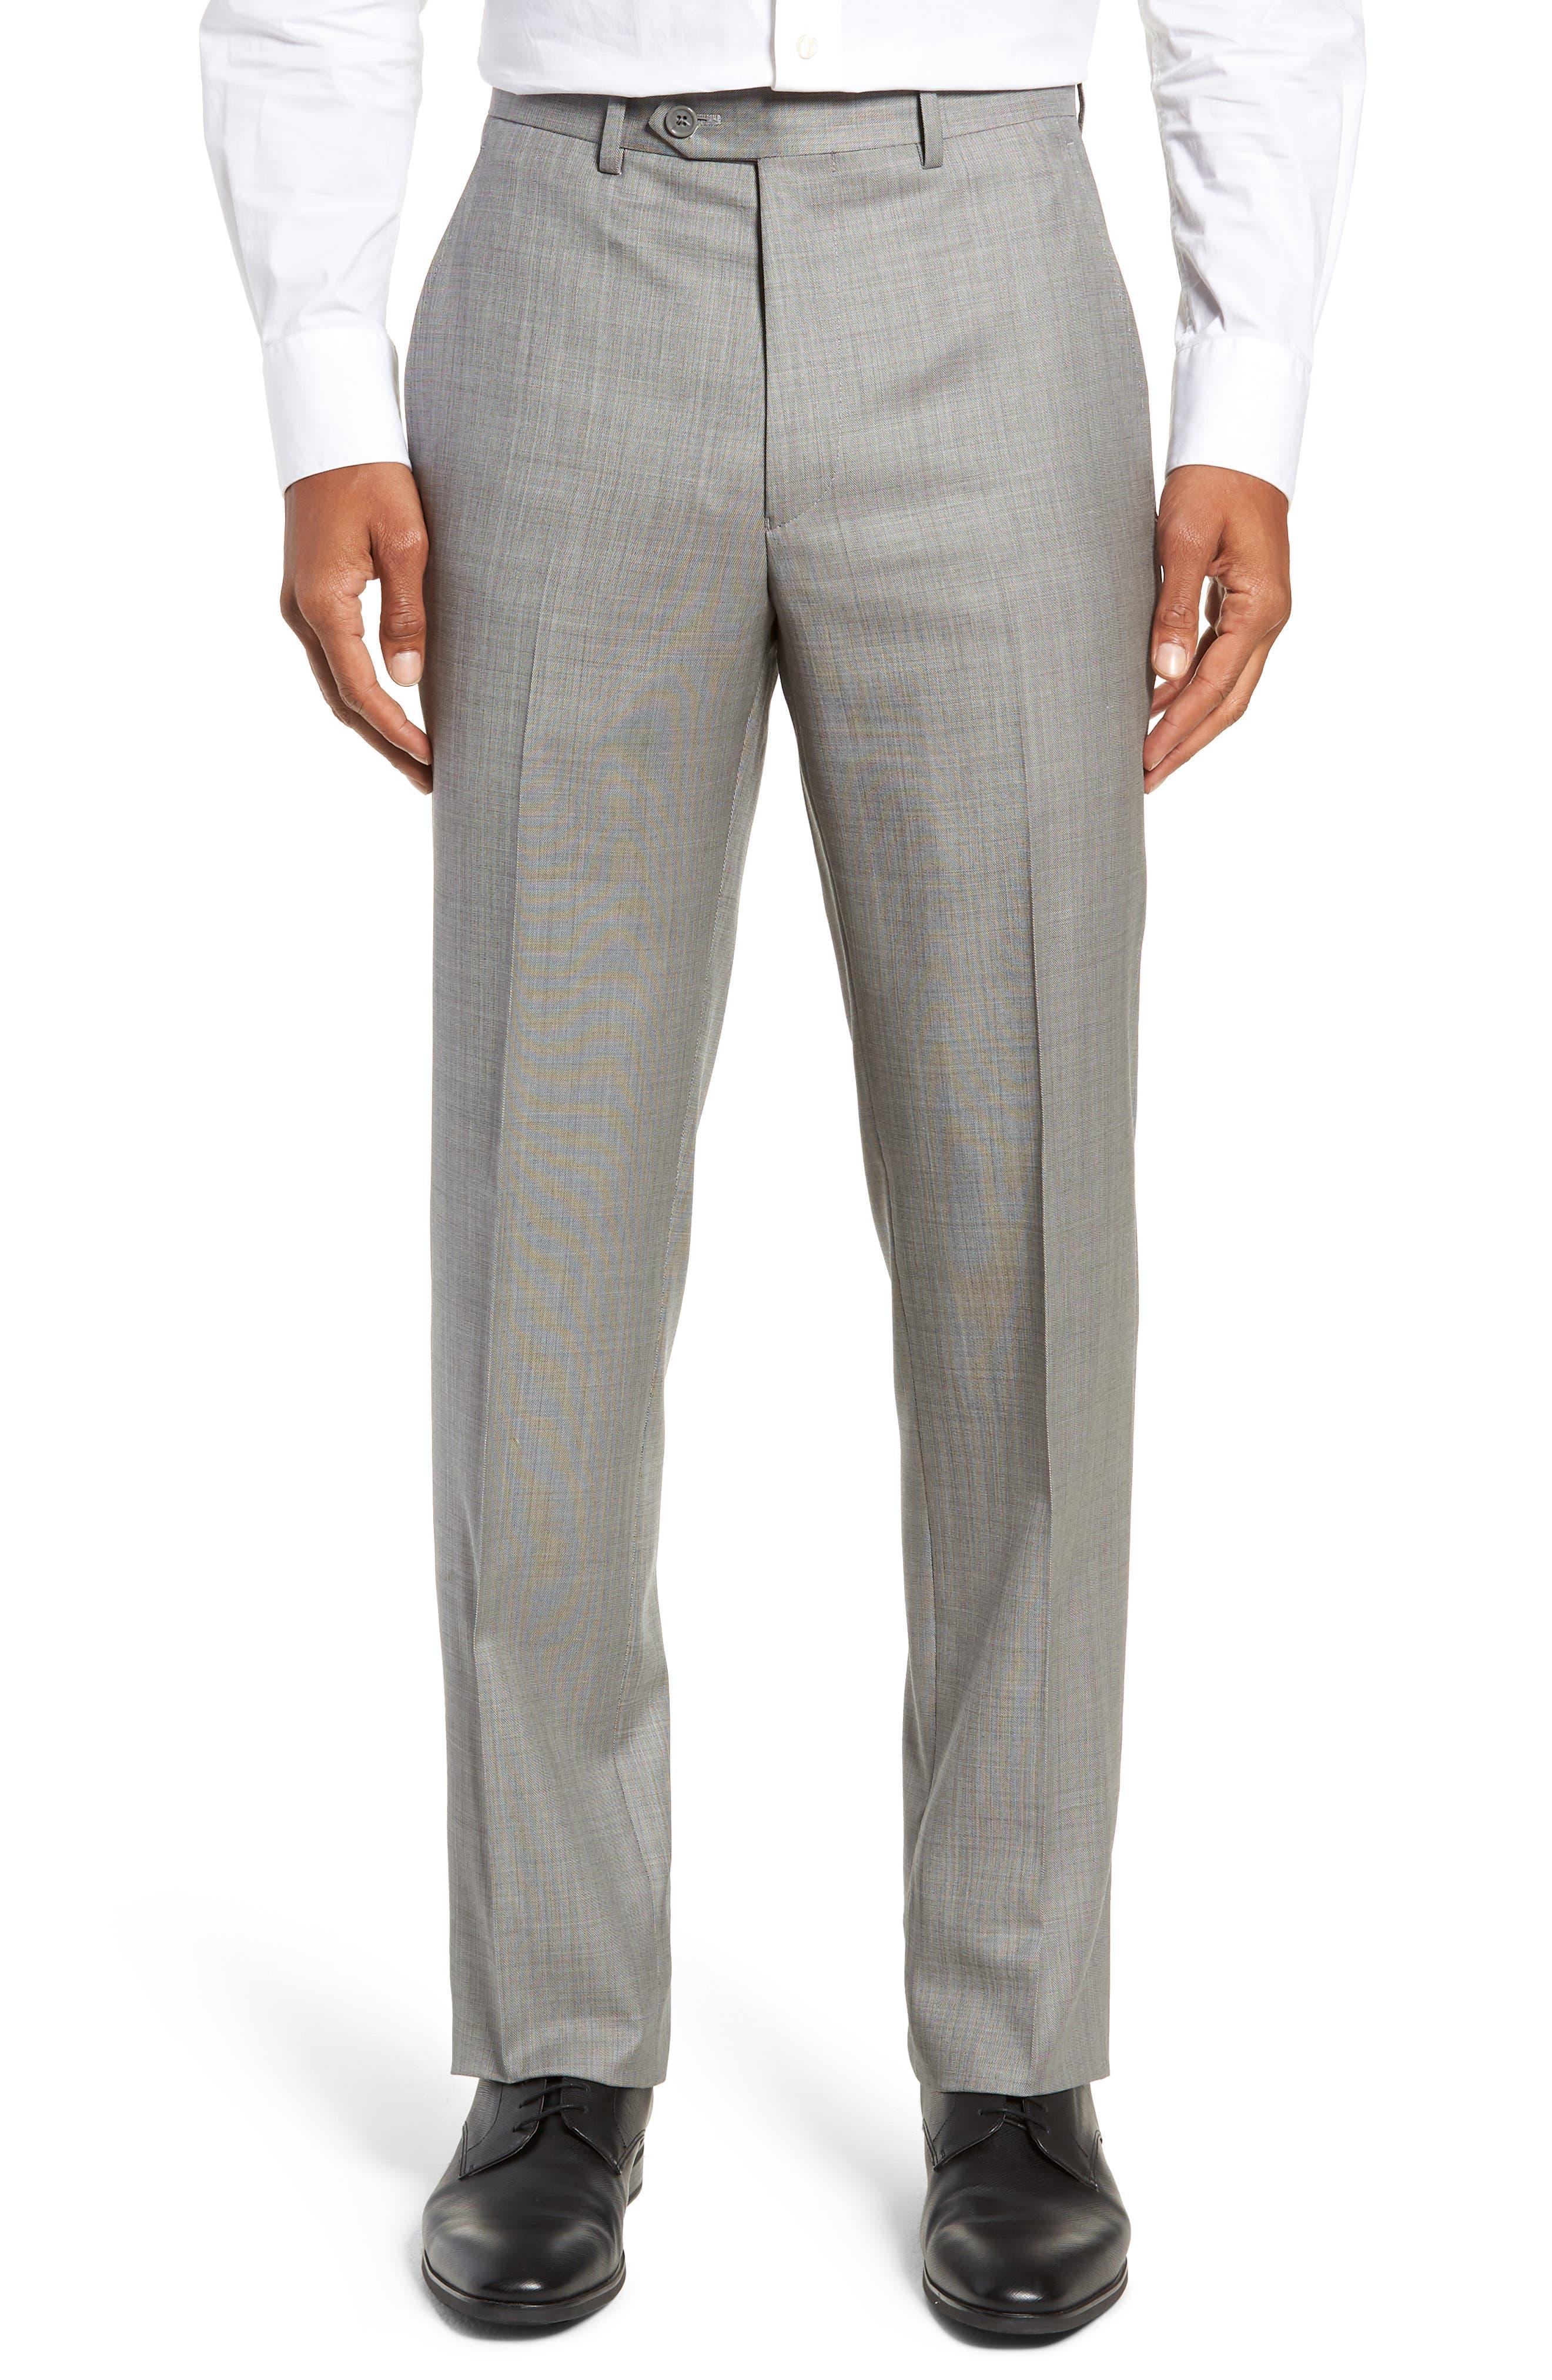 Flat Front Sharkskin Wool Trousers,                             Main thumbnail 1, color,                             LIGHT GREY